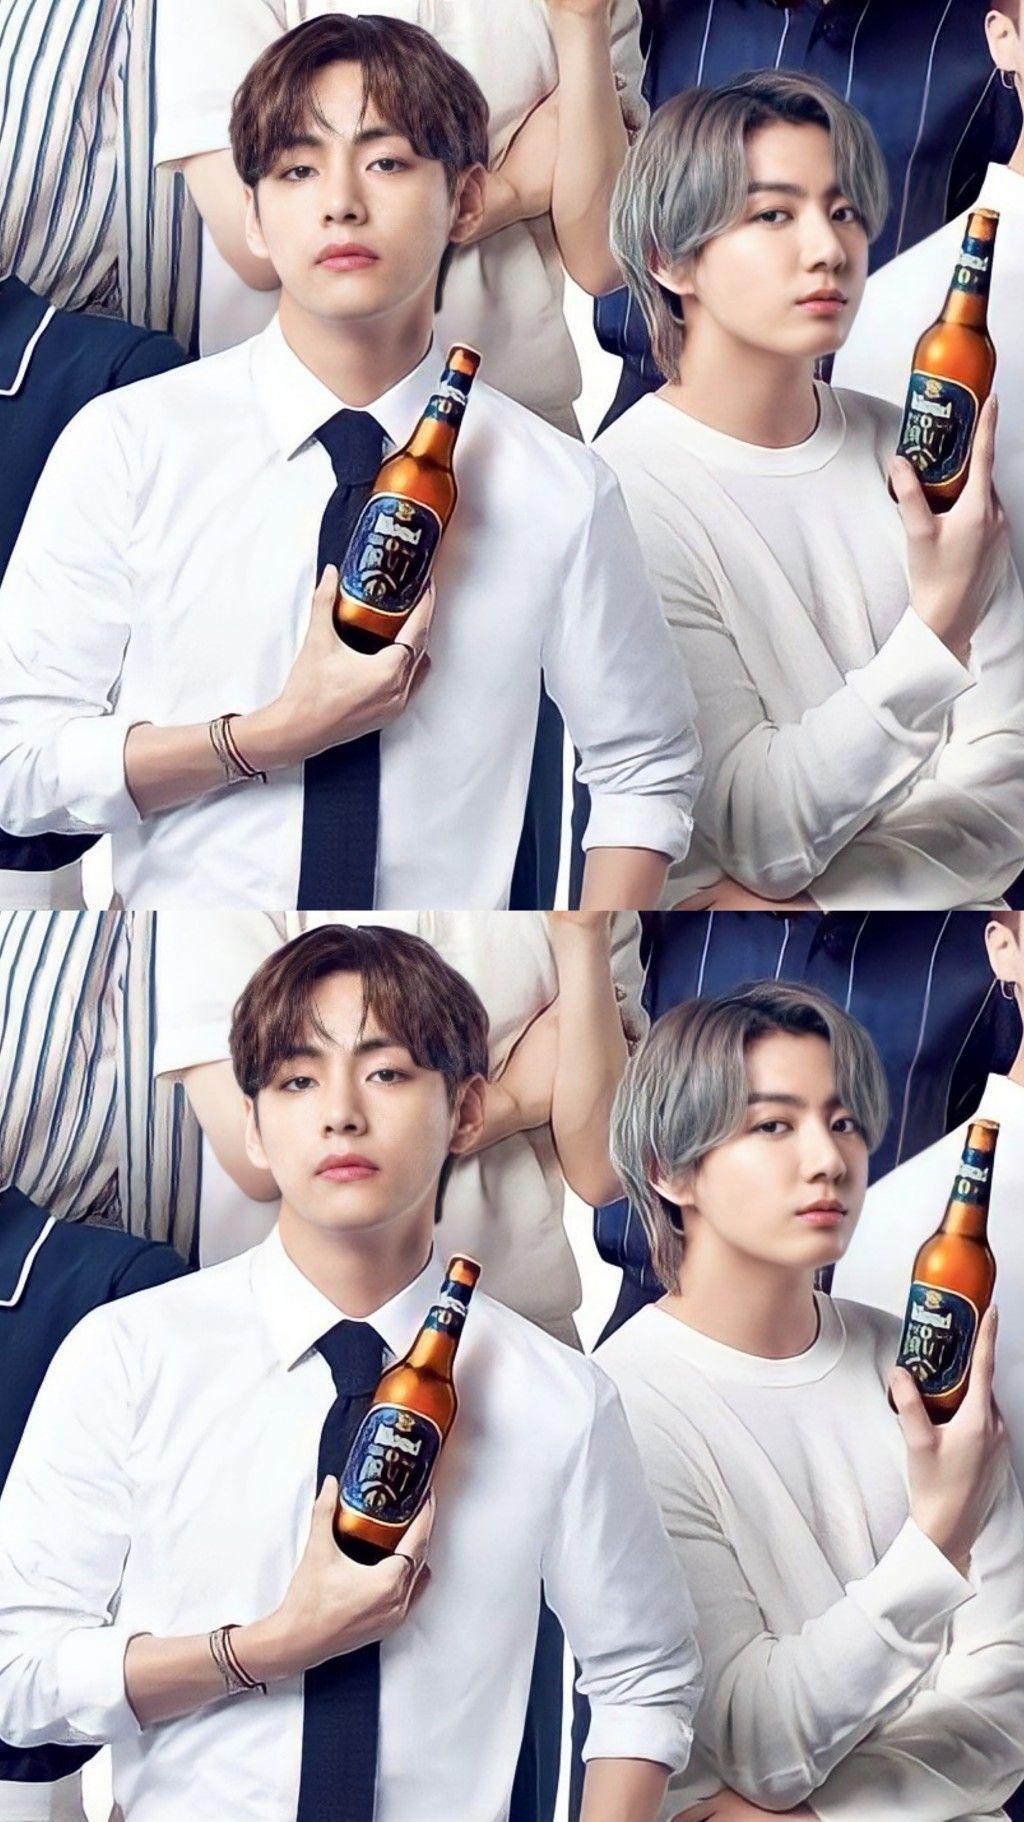 Bts X Kloud Beer 2021 テテグク グクテテ てひょん